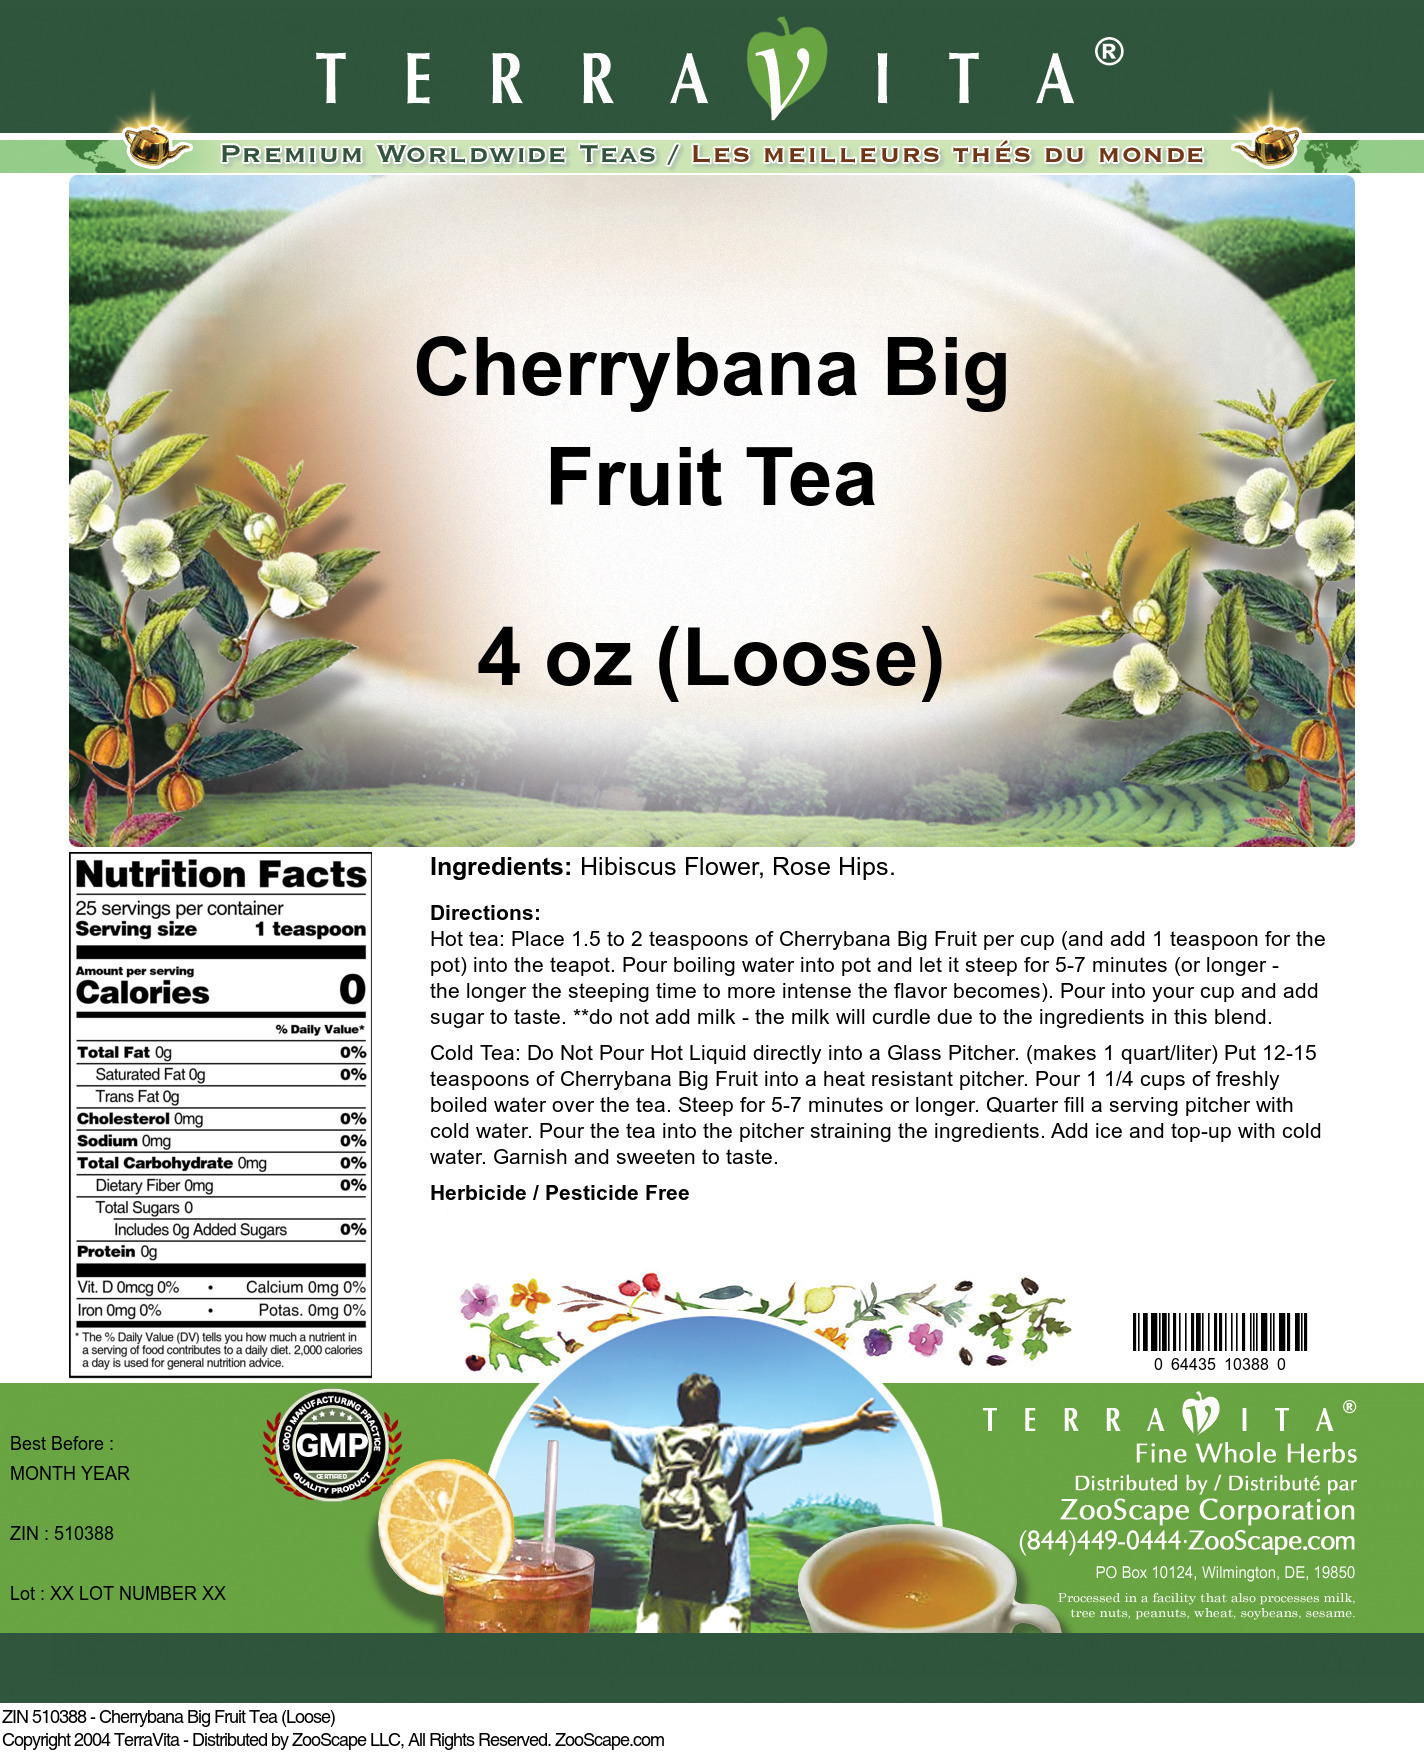 Cherrybana Big Fruit Tea (Loose)